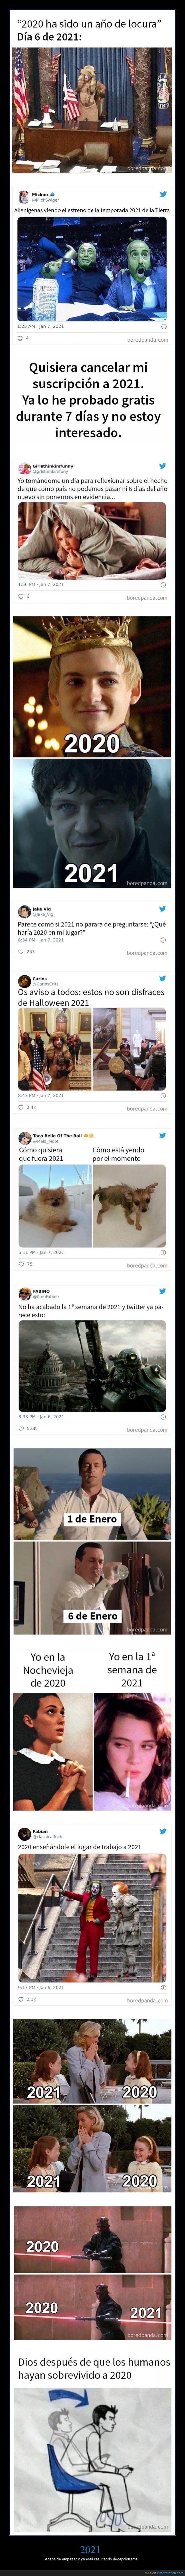 2021,memes